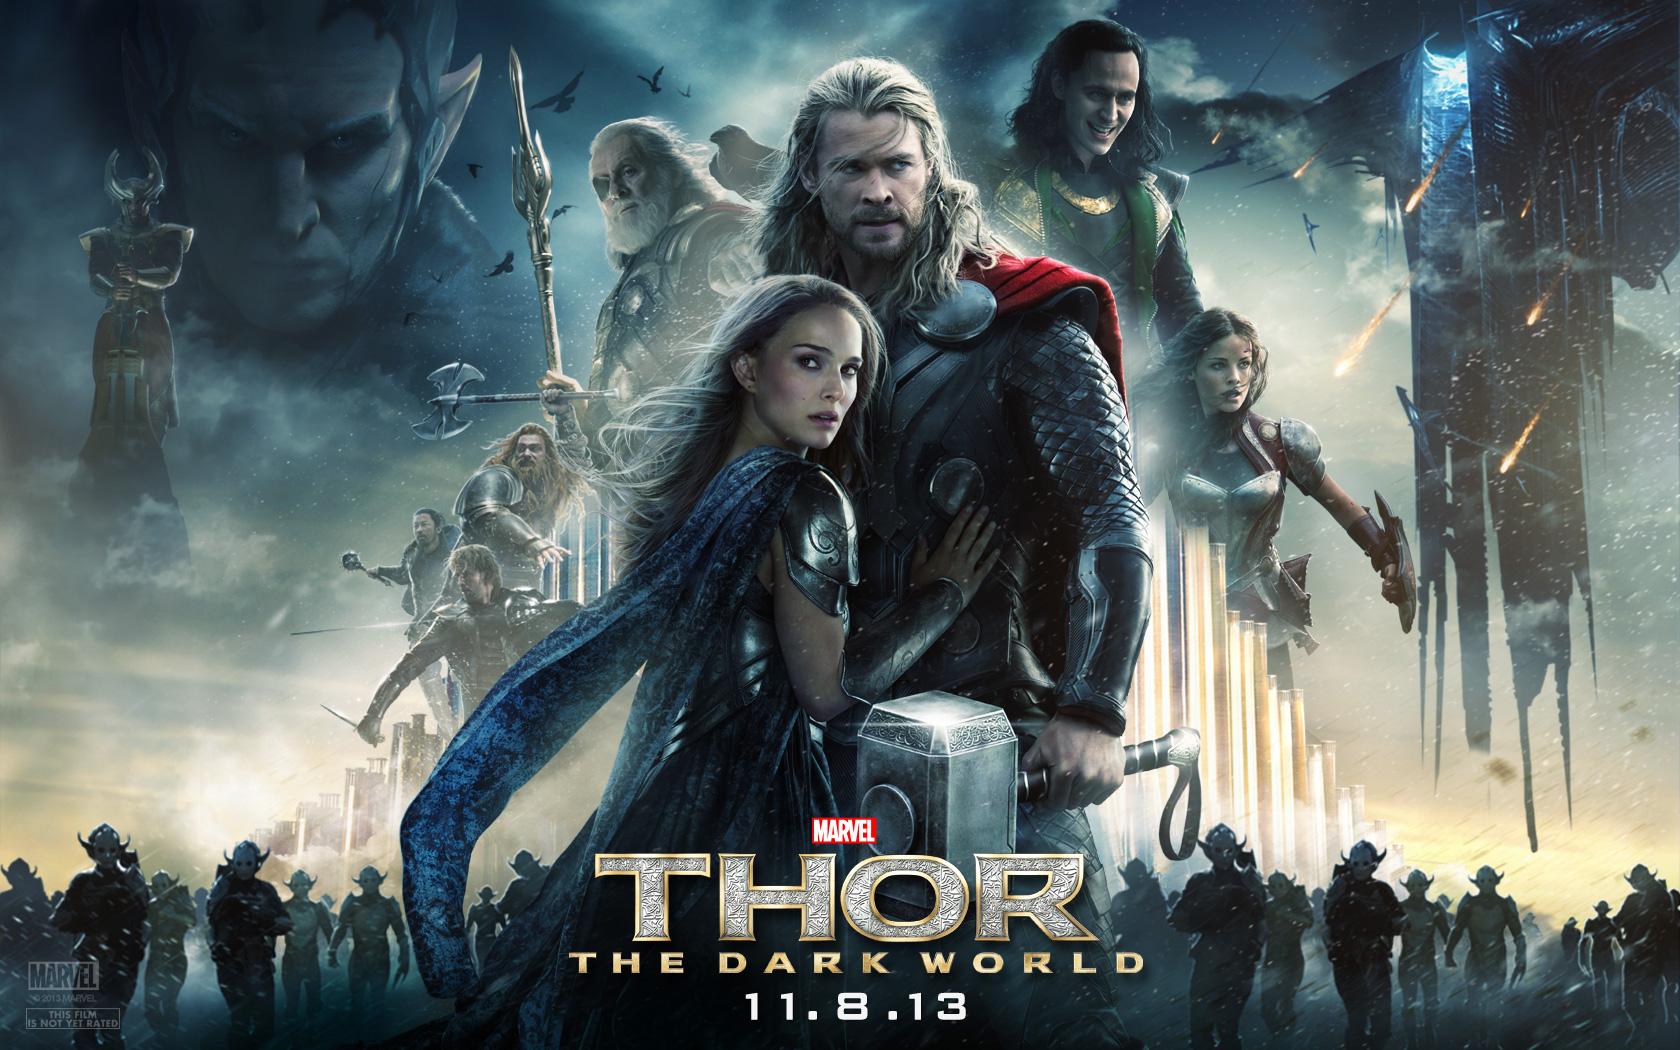 Thor The Dark World wallpaper 3